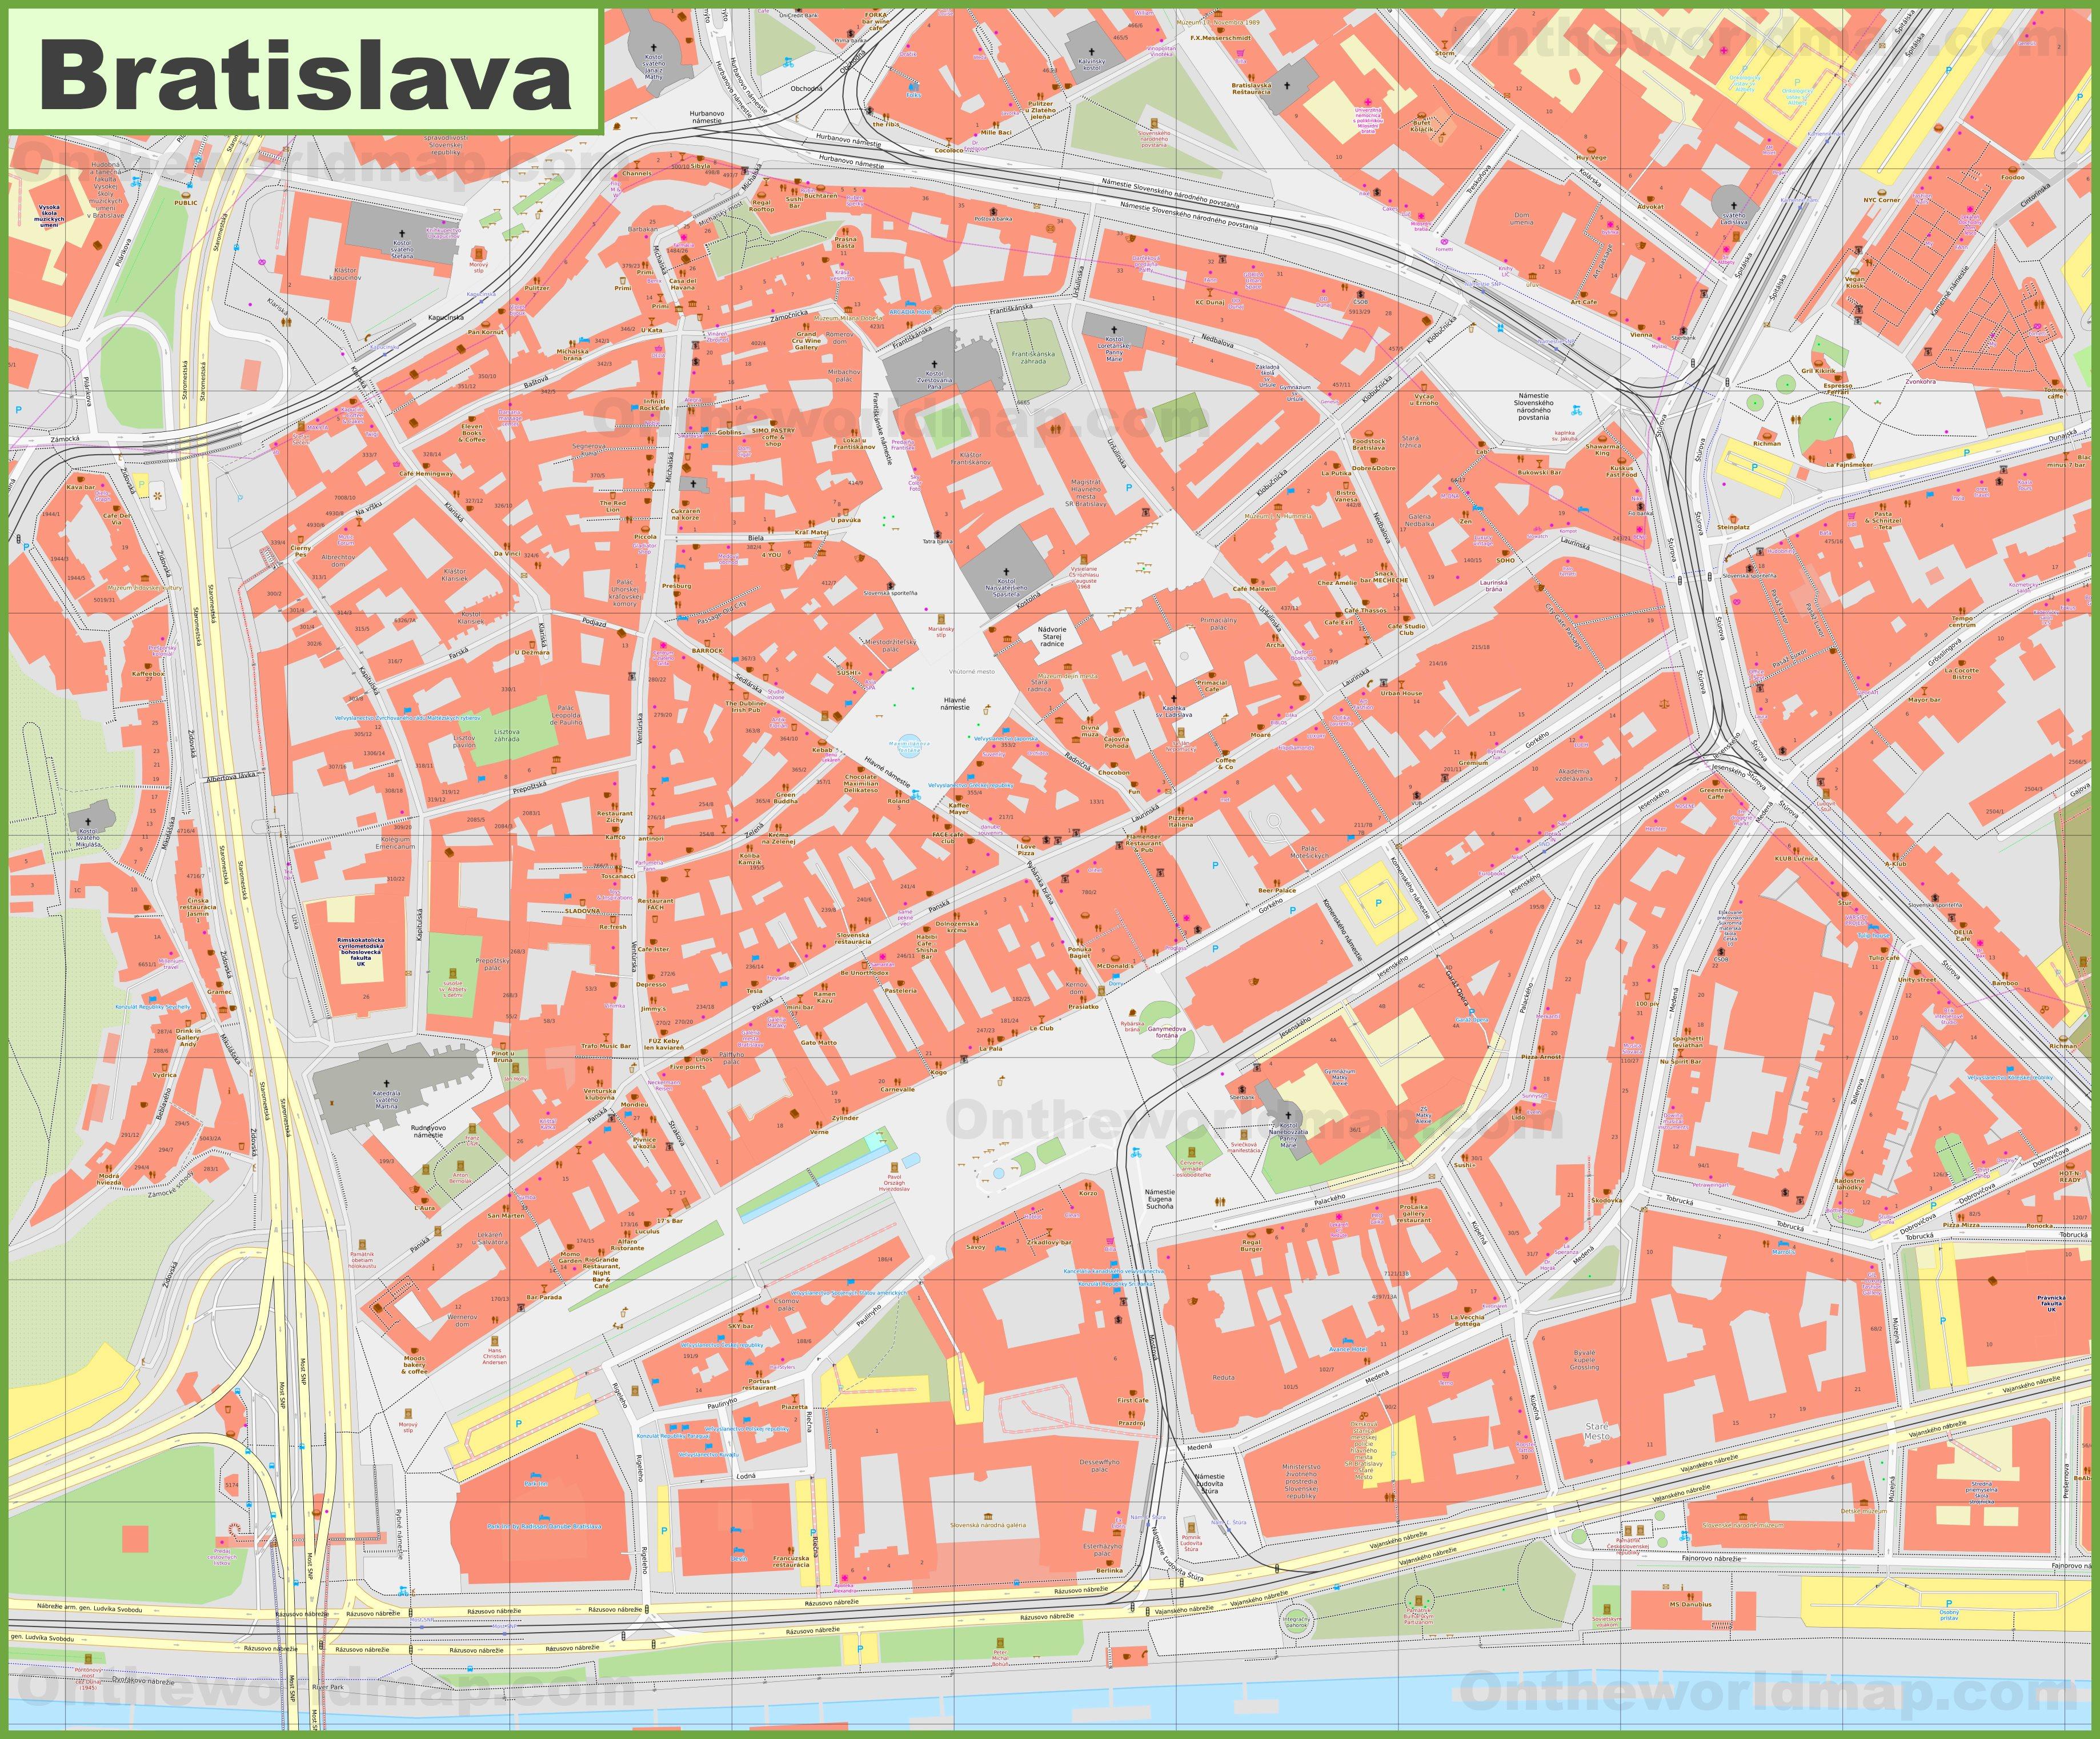 Bratislava Old Town Map